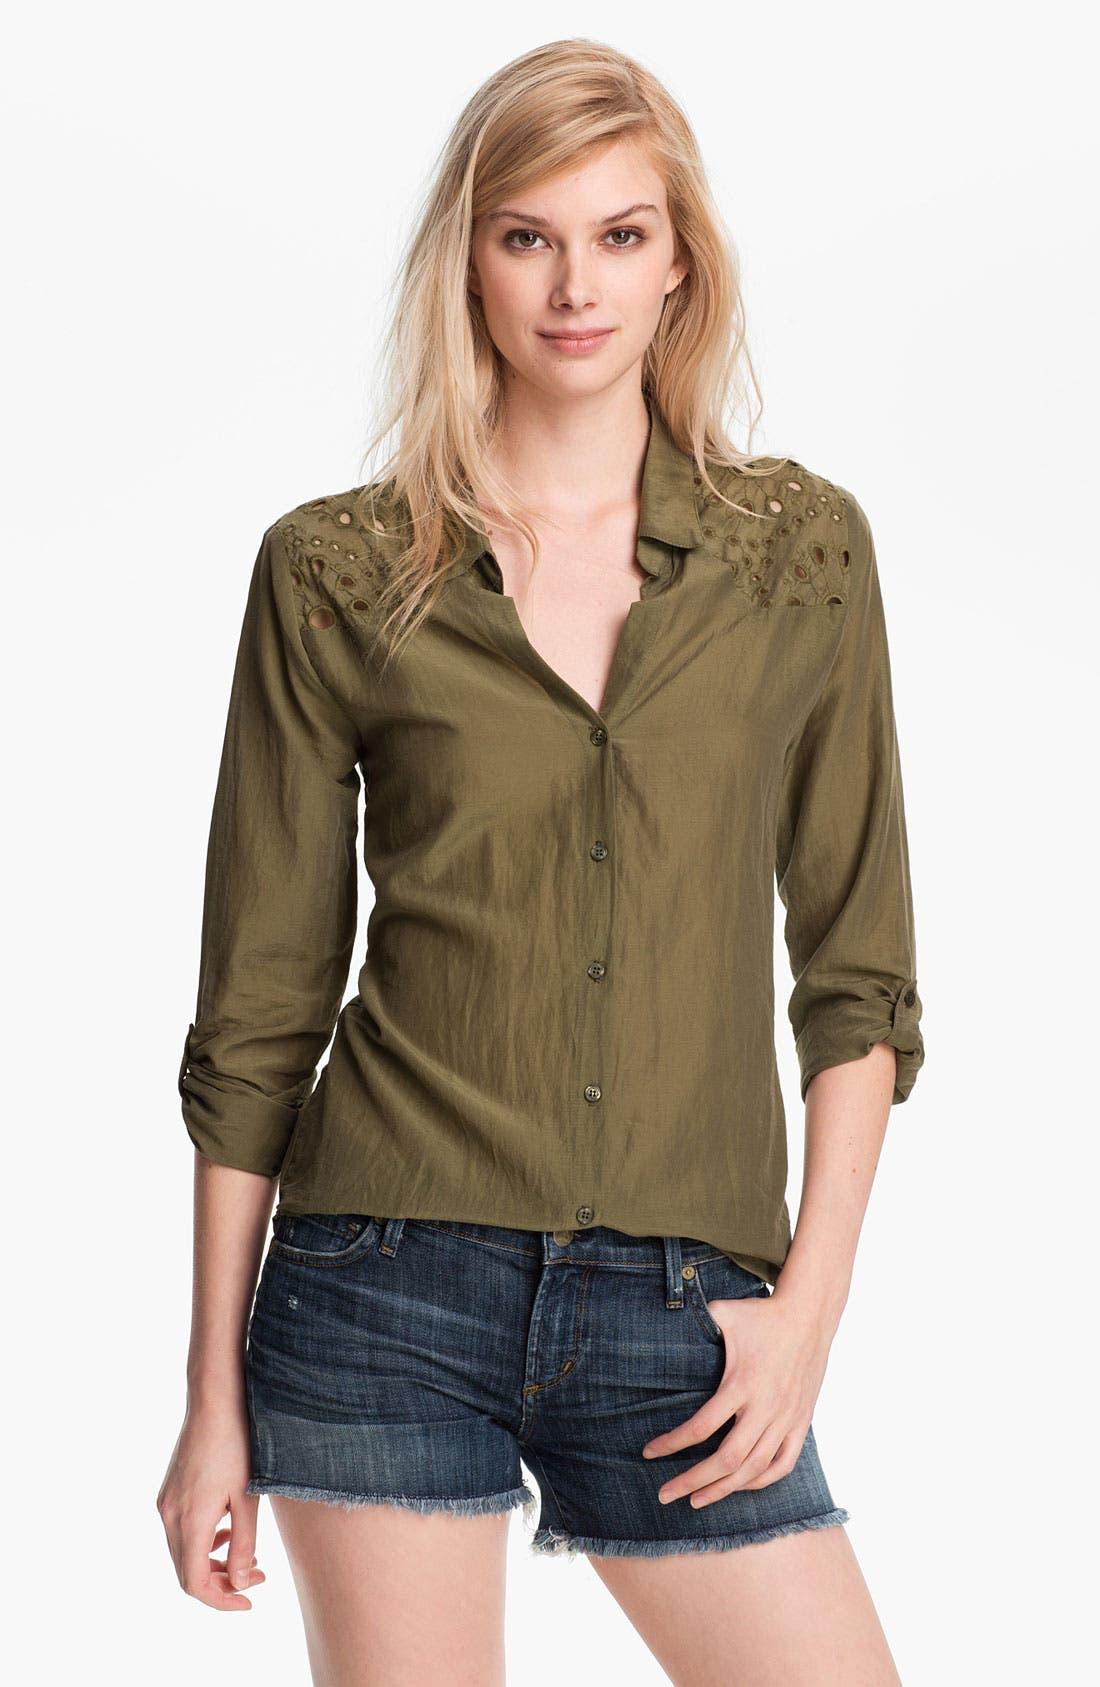 Alternate Image 1 Selected - Ella Moss 'Heidi' Eyelet Lace Trim Shirt